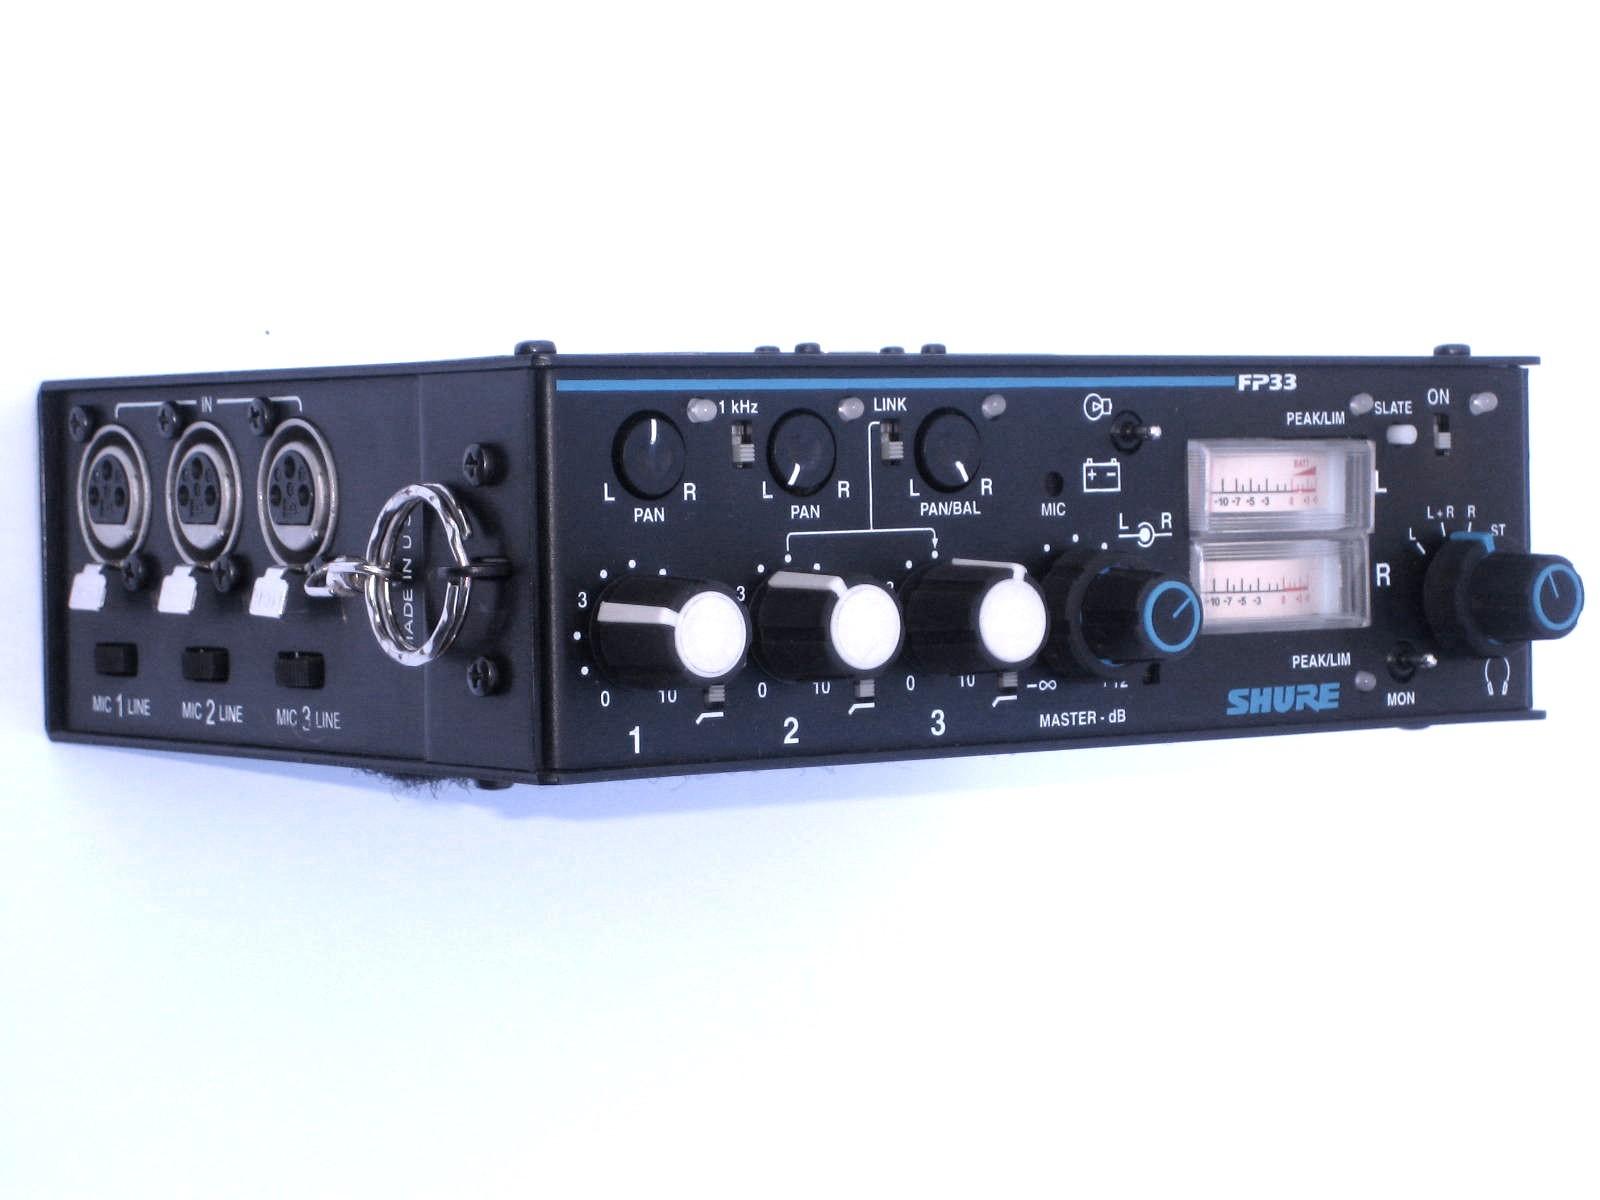 Shure FP33 Mixer, Audio Equipment Rental Nyc, Brooklyn